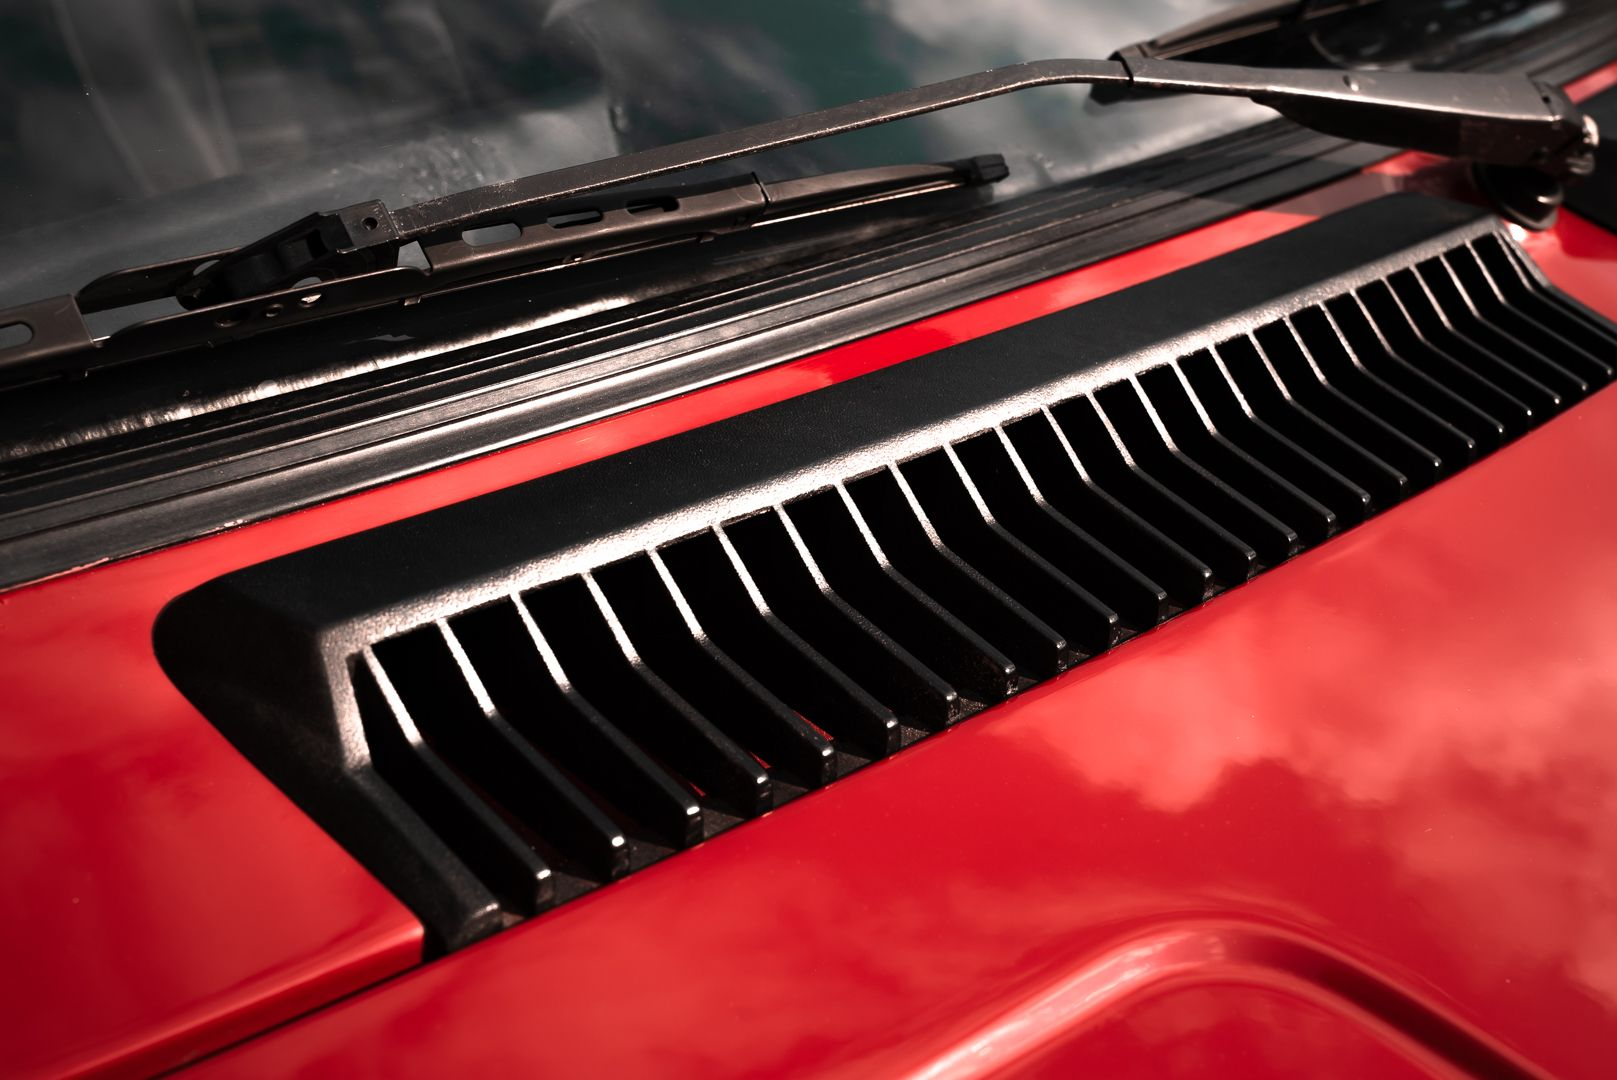 1981 Alfa Romeo Alfetta GTV Gran Prix n.128 68572